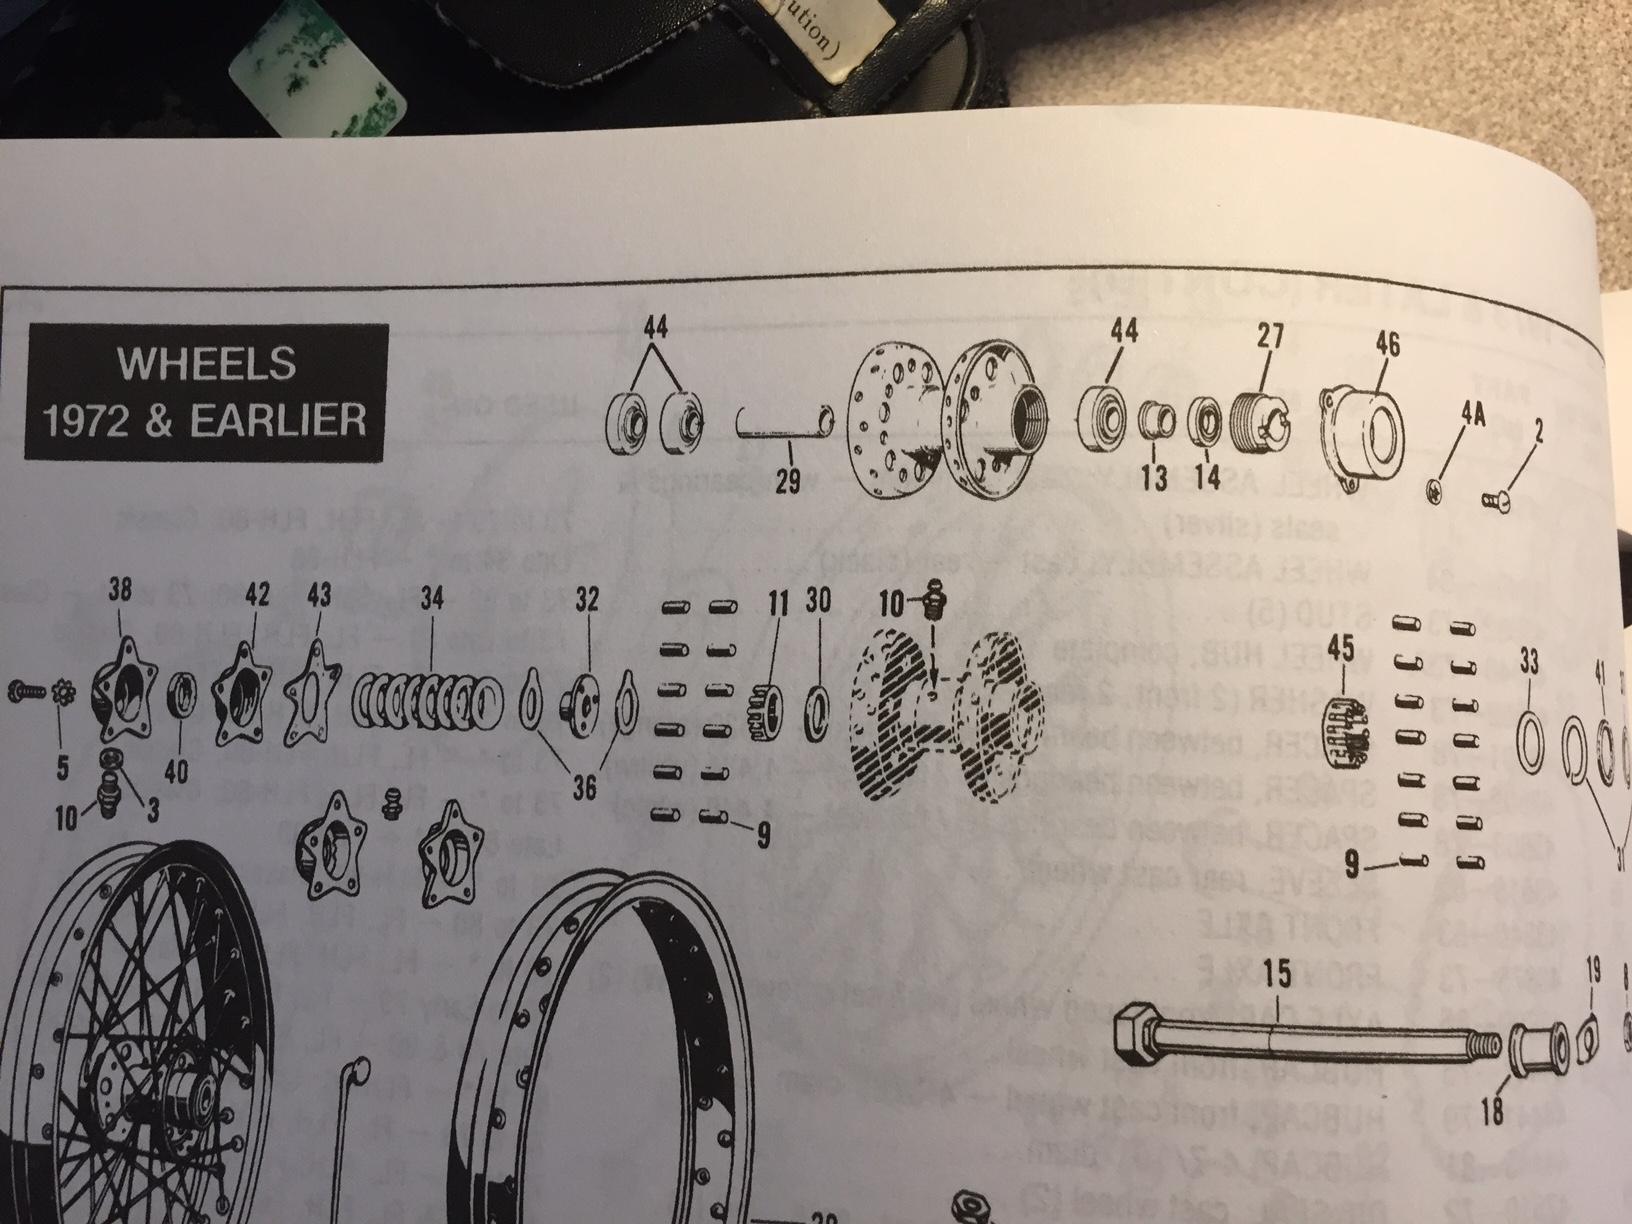 hight resolution of 1972 flh rear wheel bearing spacer wheel bearing diagram jpg